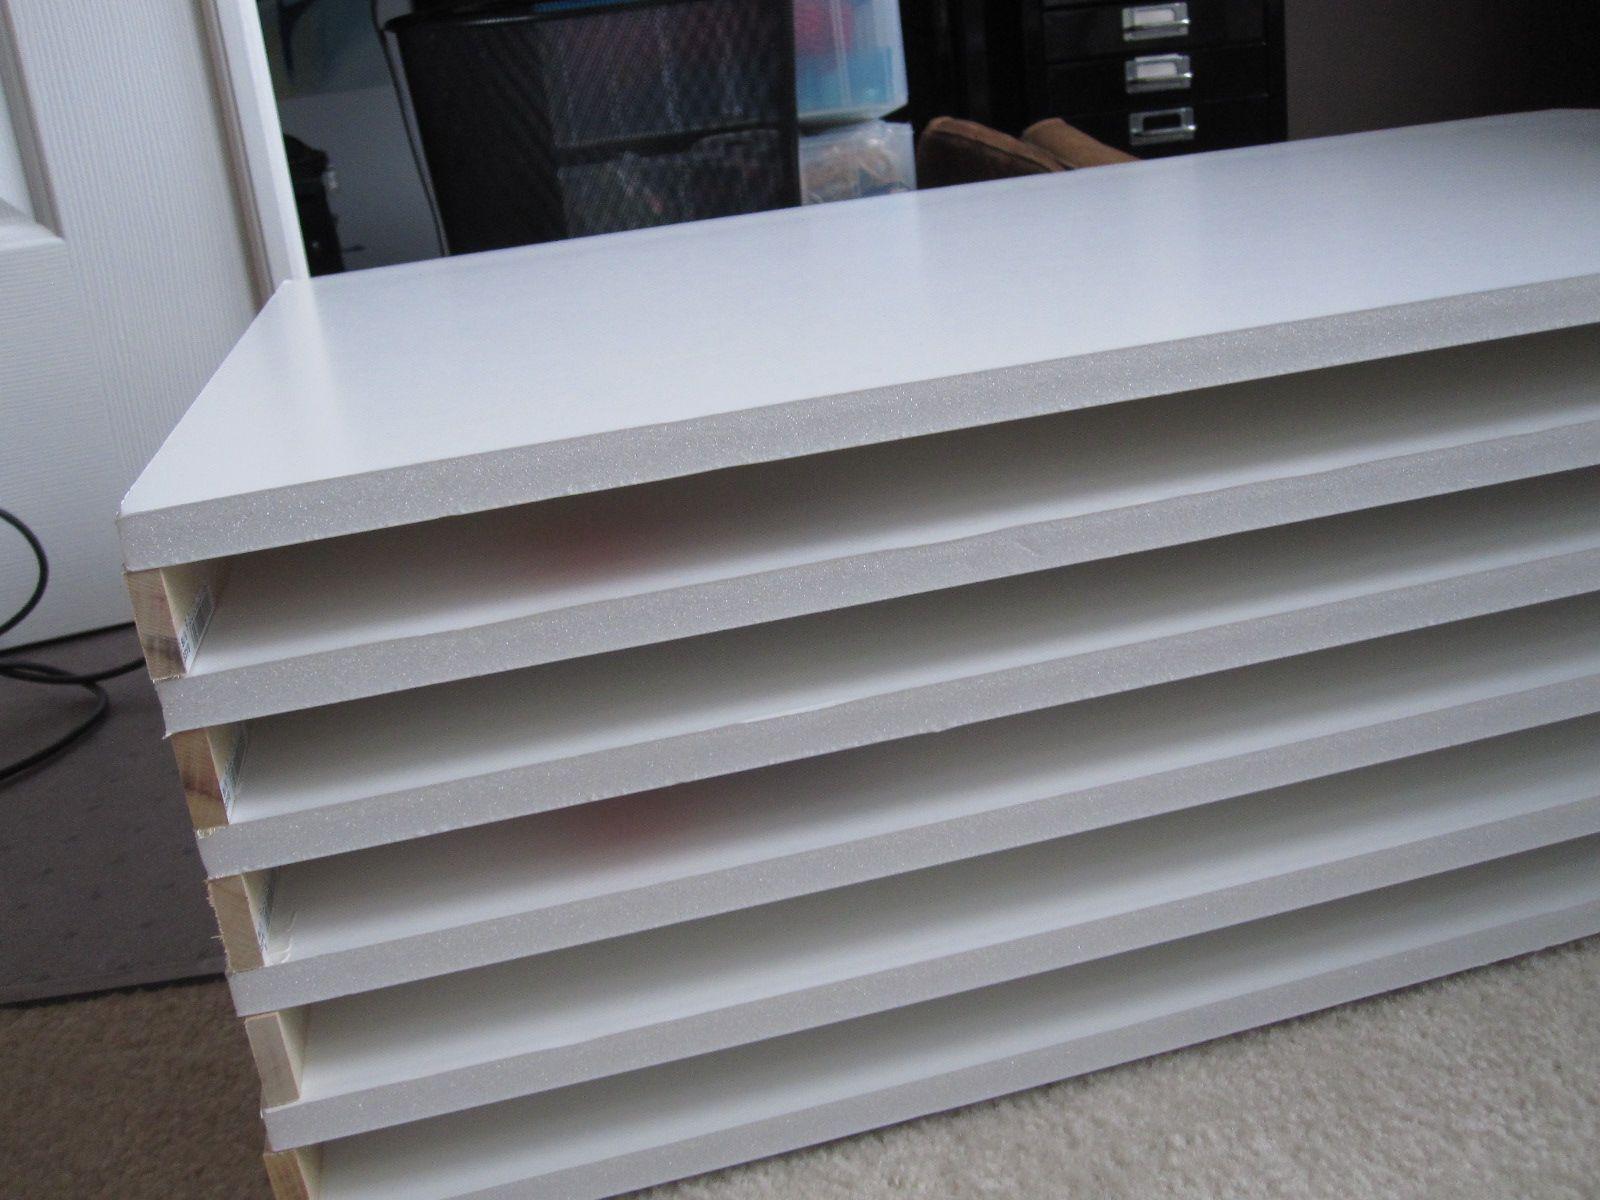 Flat Files Diy For 40 6 Sheets Of 1 2 Foam Core 20 30 10